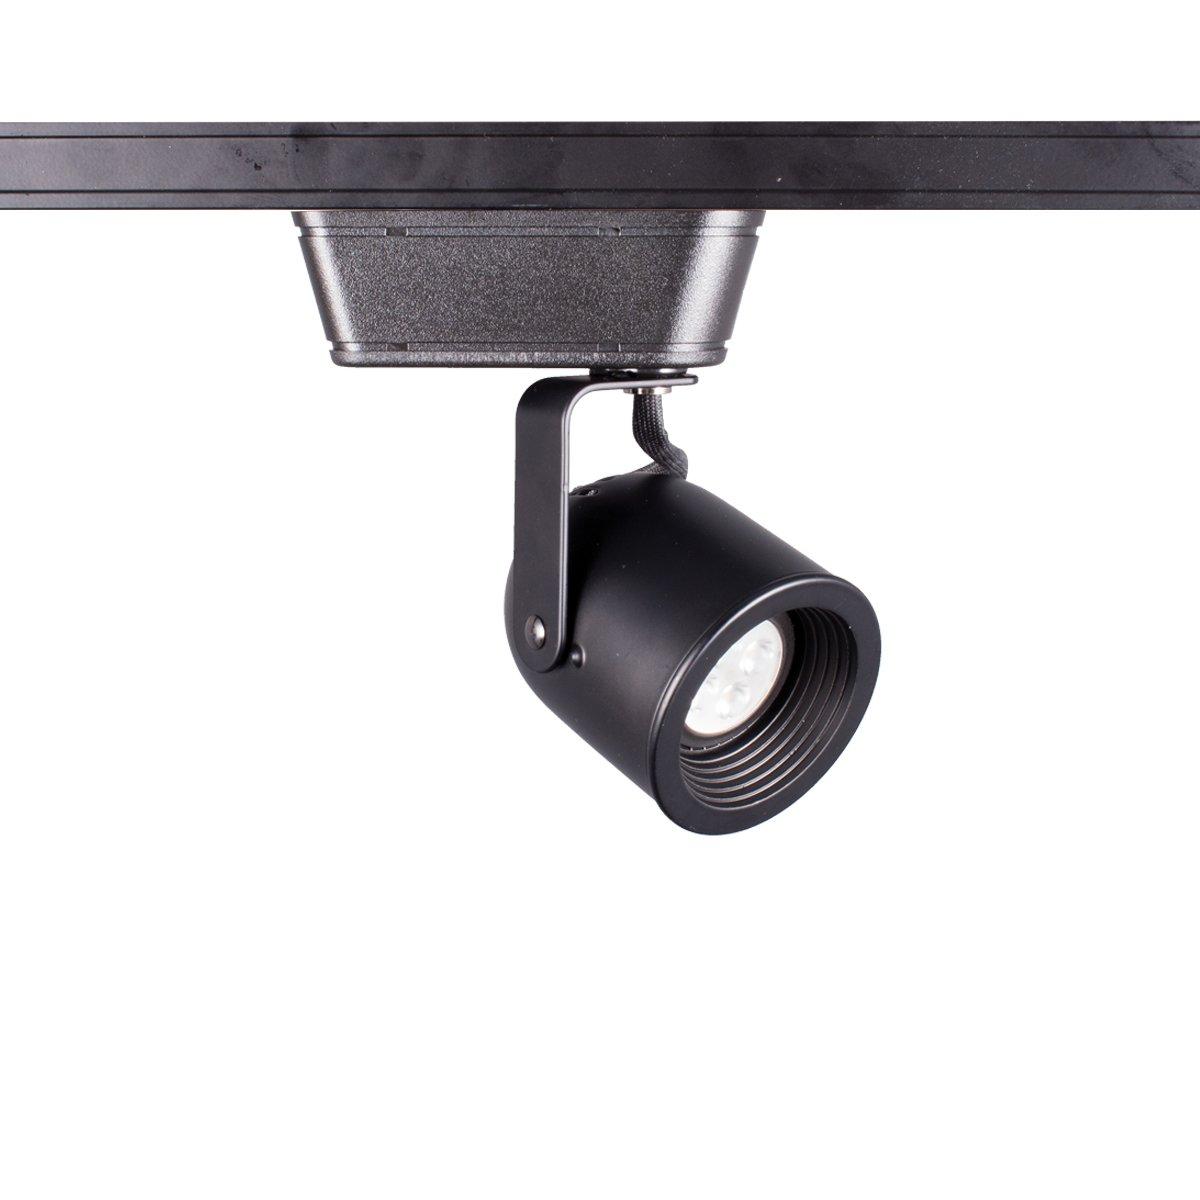 WAC Lighting JHT-808LED-BK Low Voltage 120V Track Luminaire